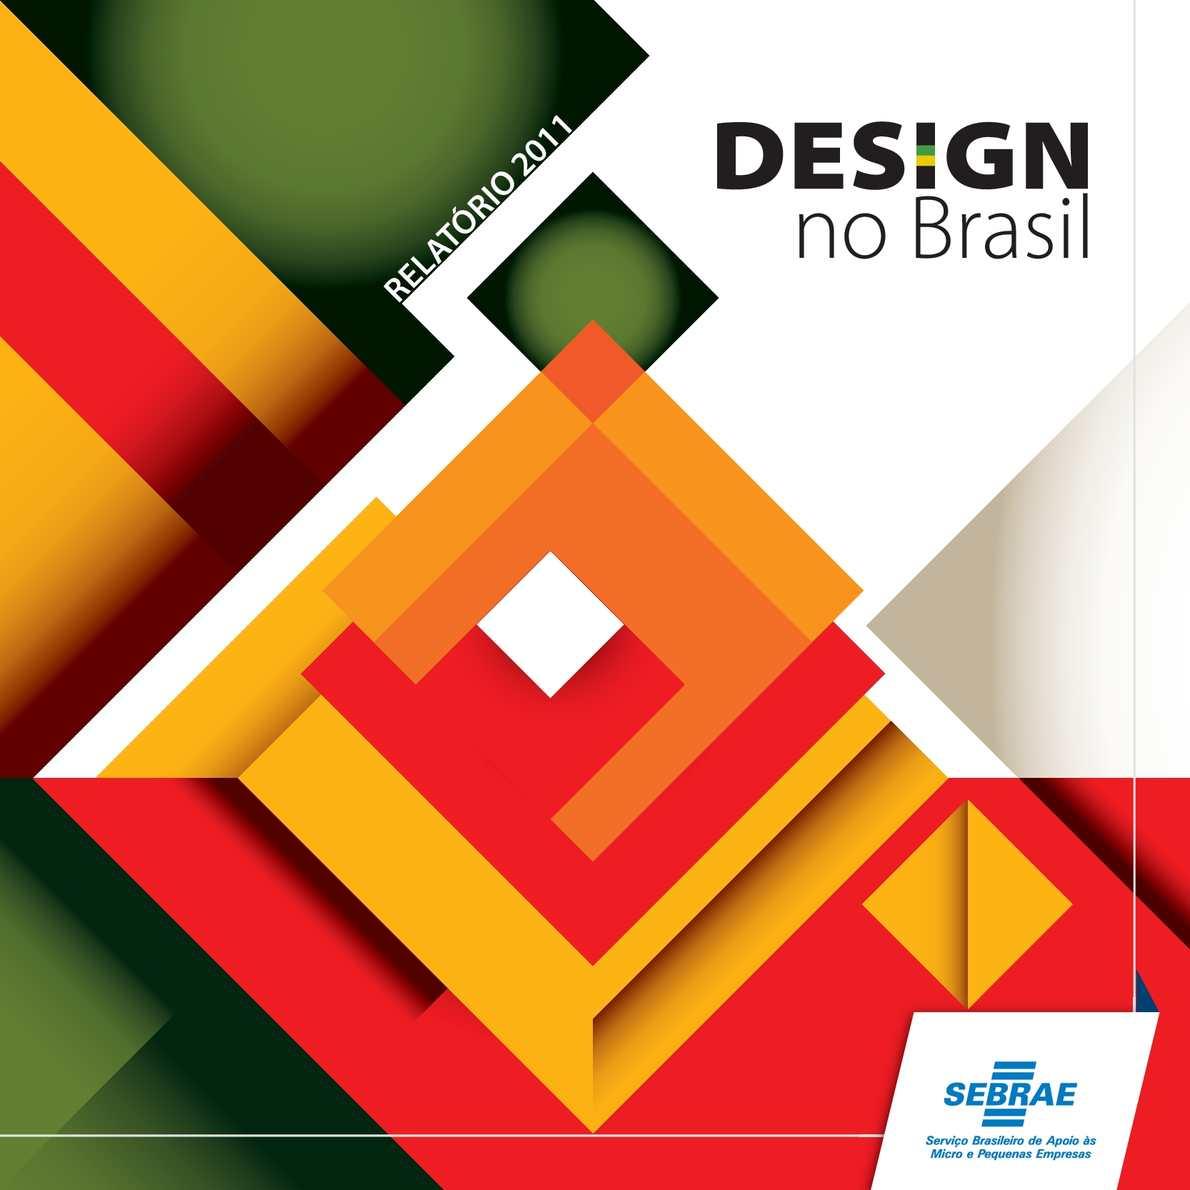 Calaméo - Relatório 2011 Design no Brasil 73aadb22be